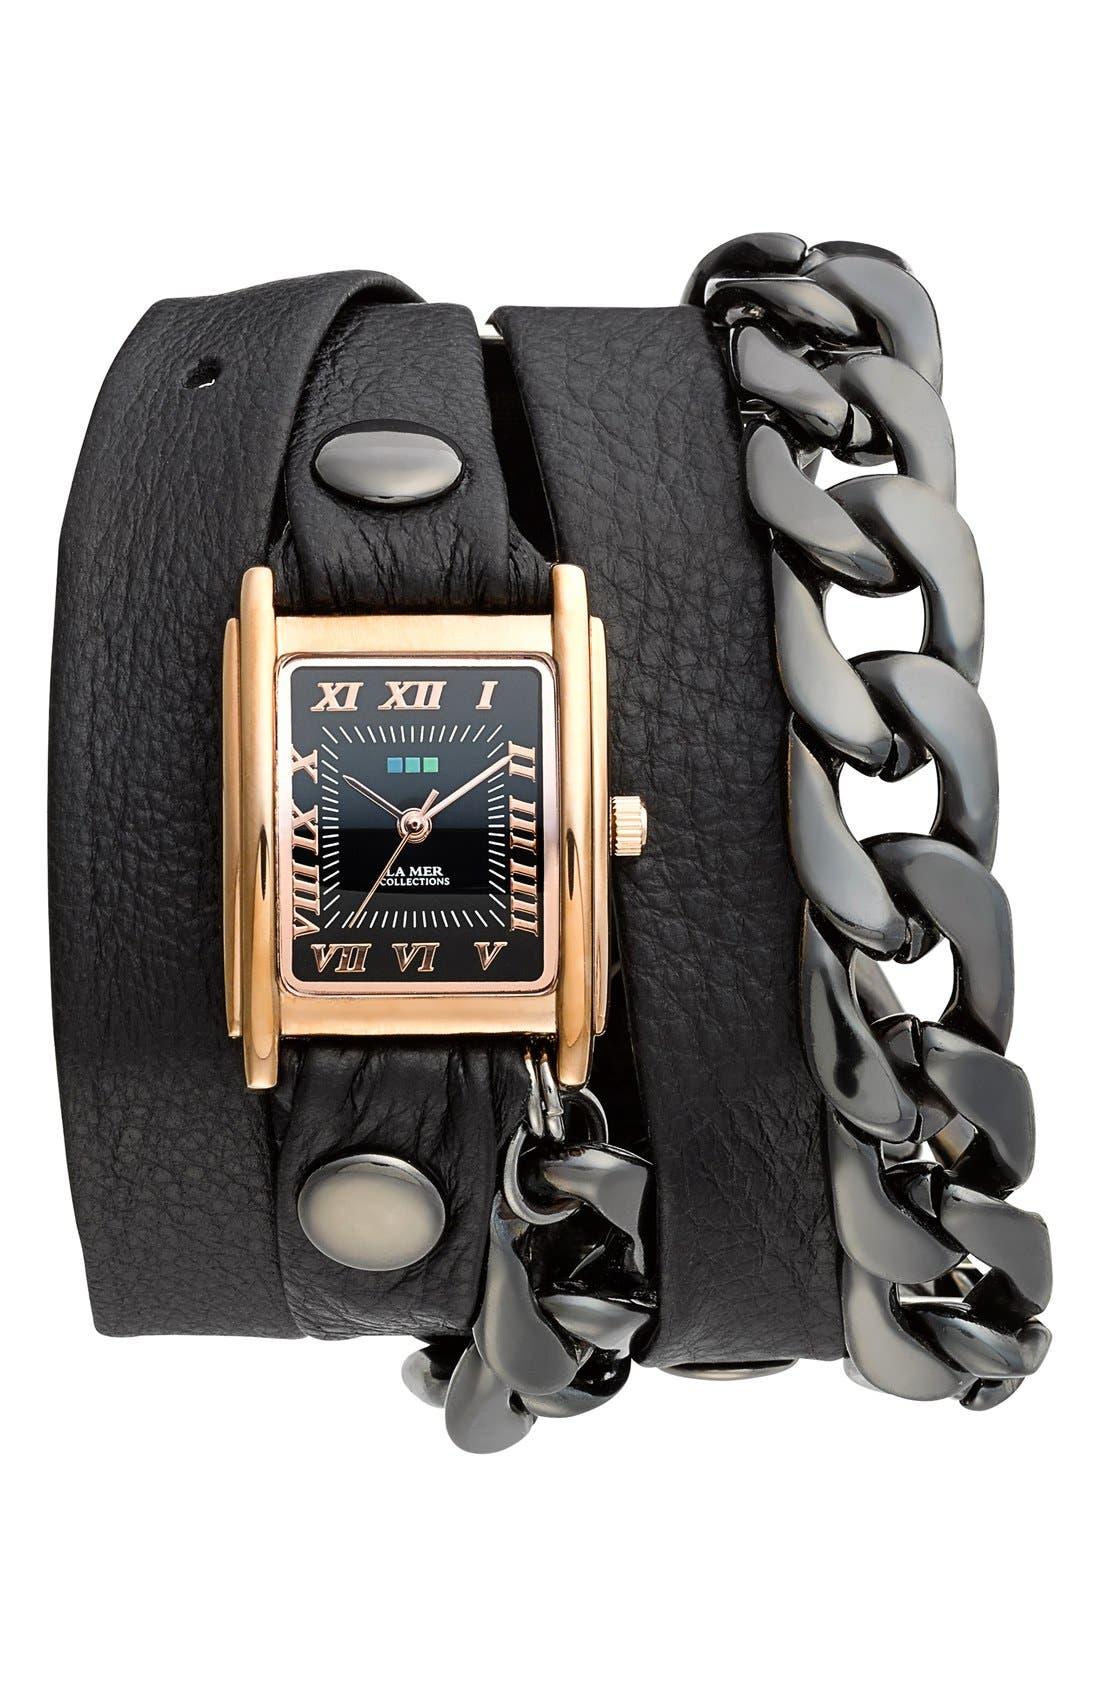 Alternate Image 1 Selected - La Mer Collections 'Gunmetal Malibu' Leather & Chain Wrap Bracelet Watch, 23mm x 30mm